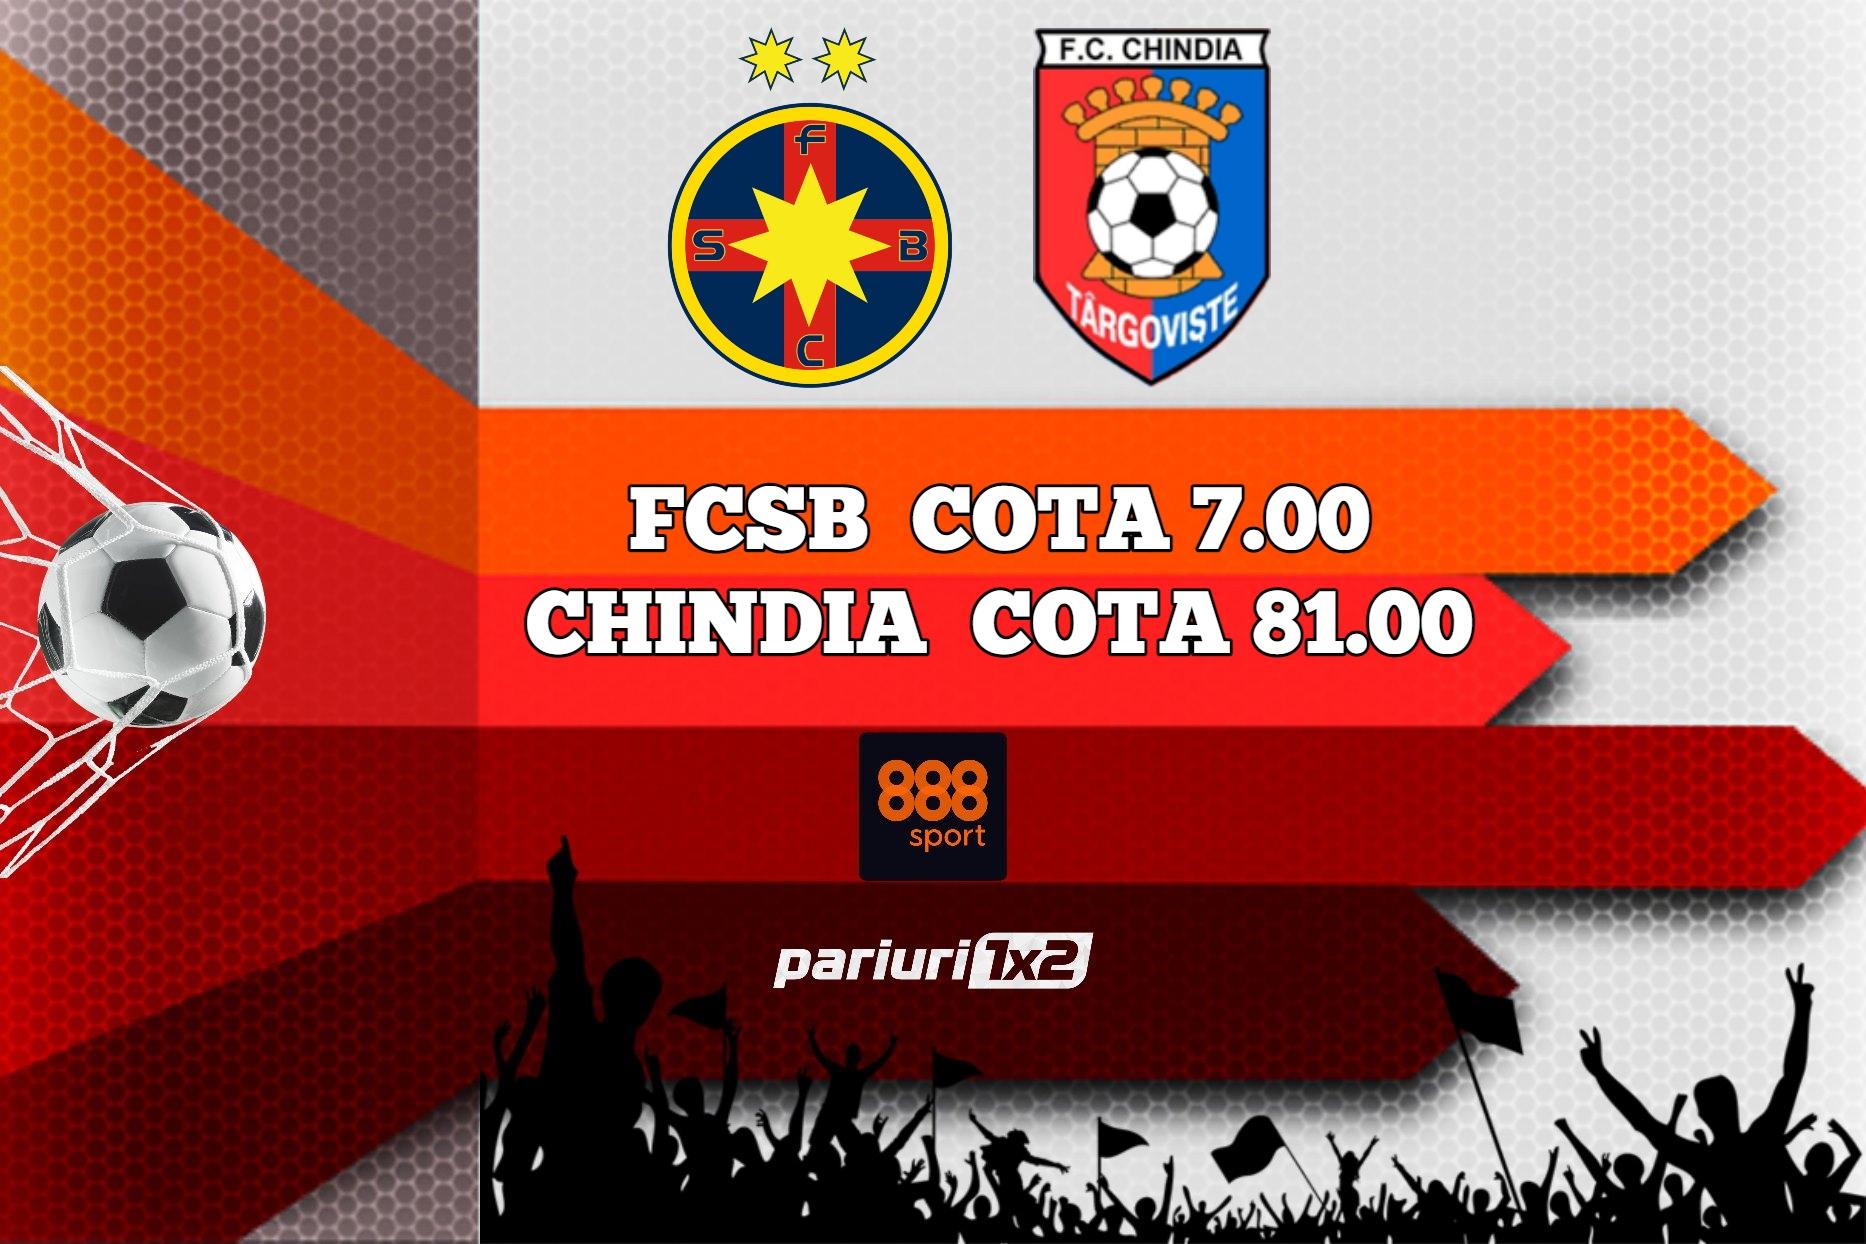 FCSB - Chindia